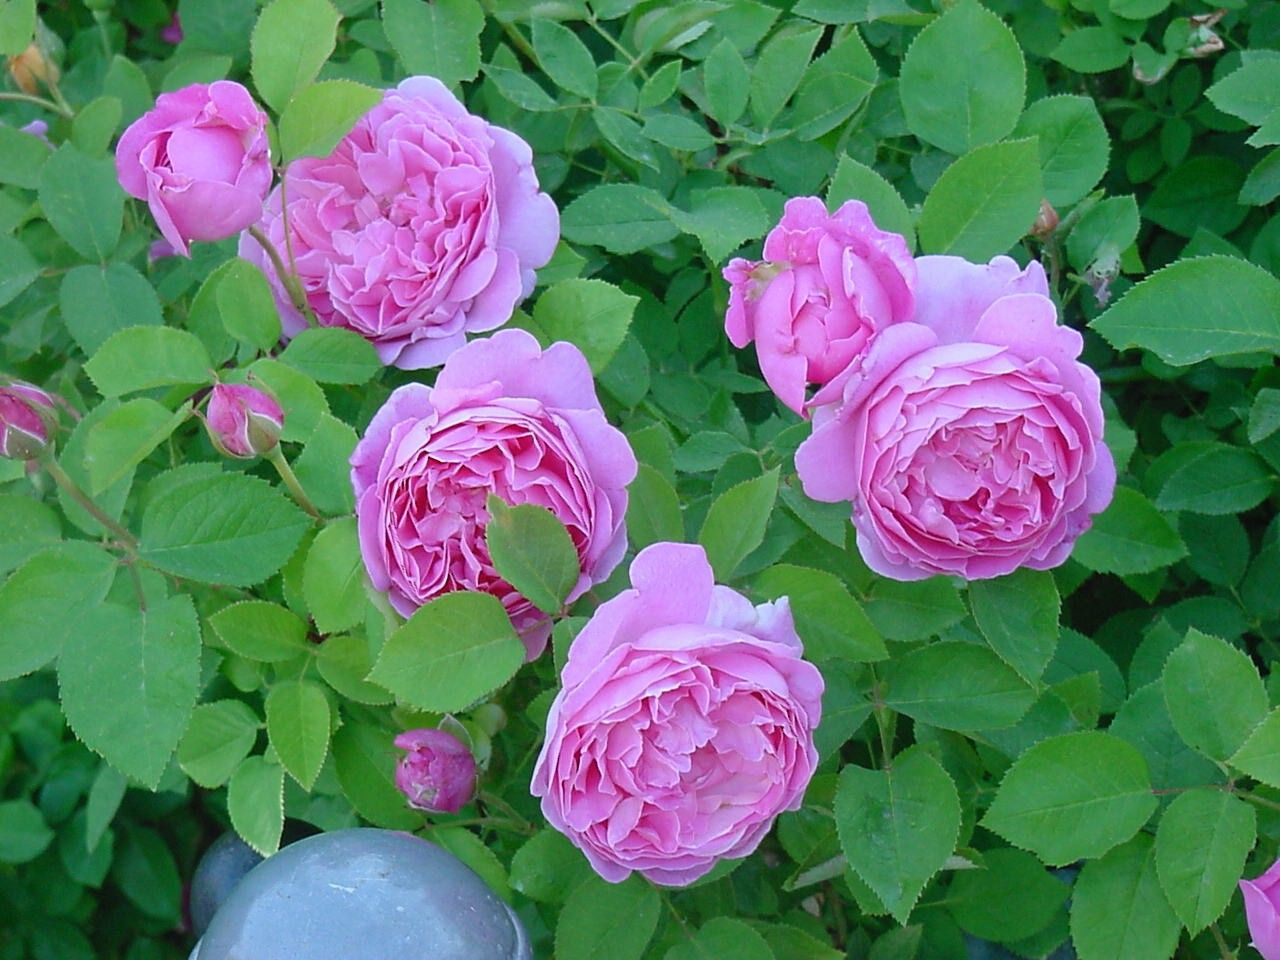 david austin 39 mary rose 39 rose flowers pinterest. Black Bedroom Furniture Sets. Home Design Ideas